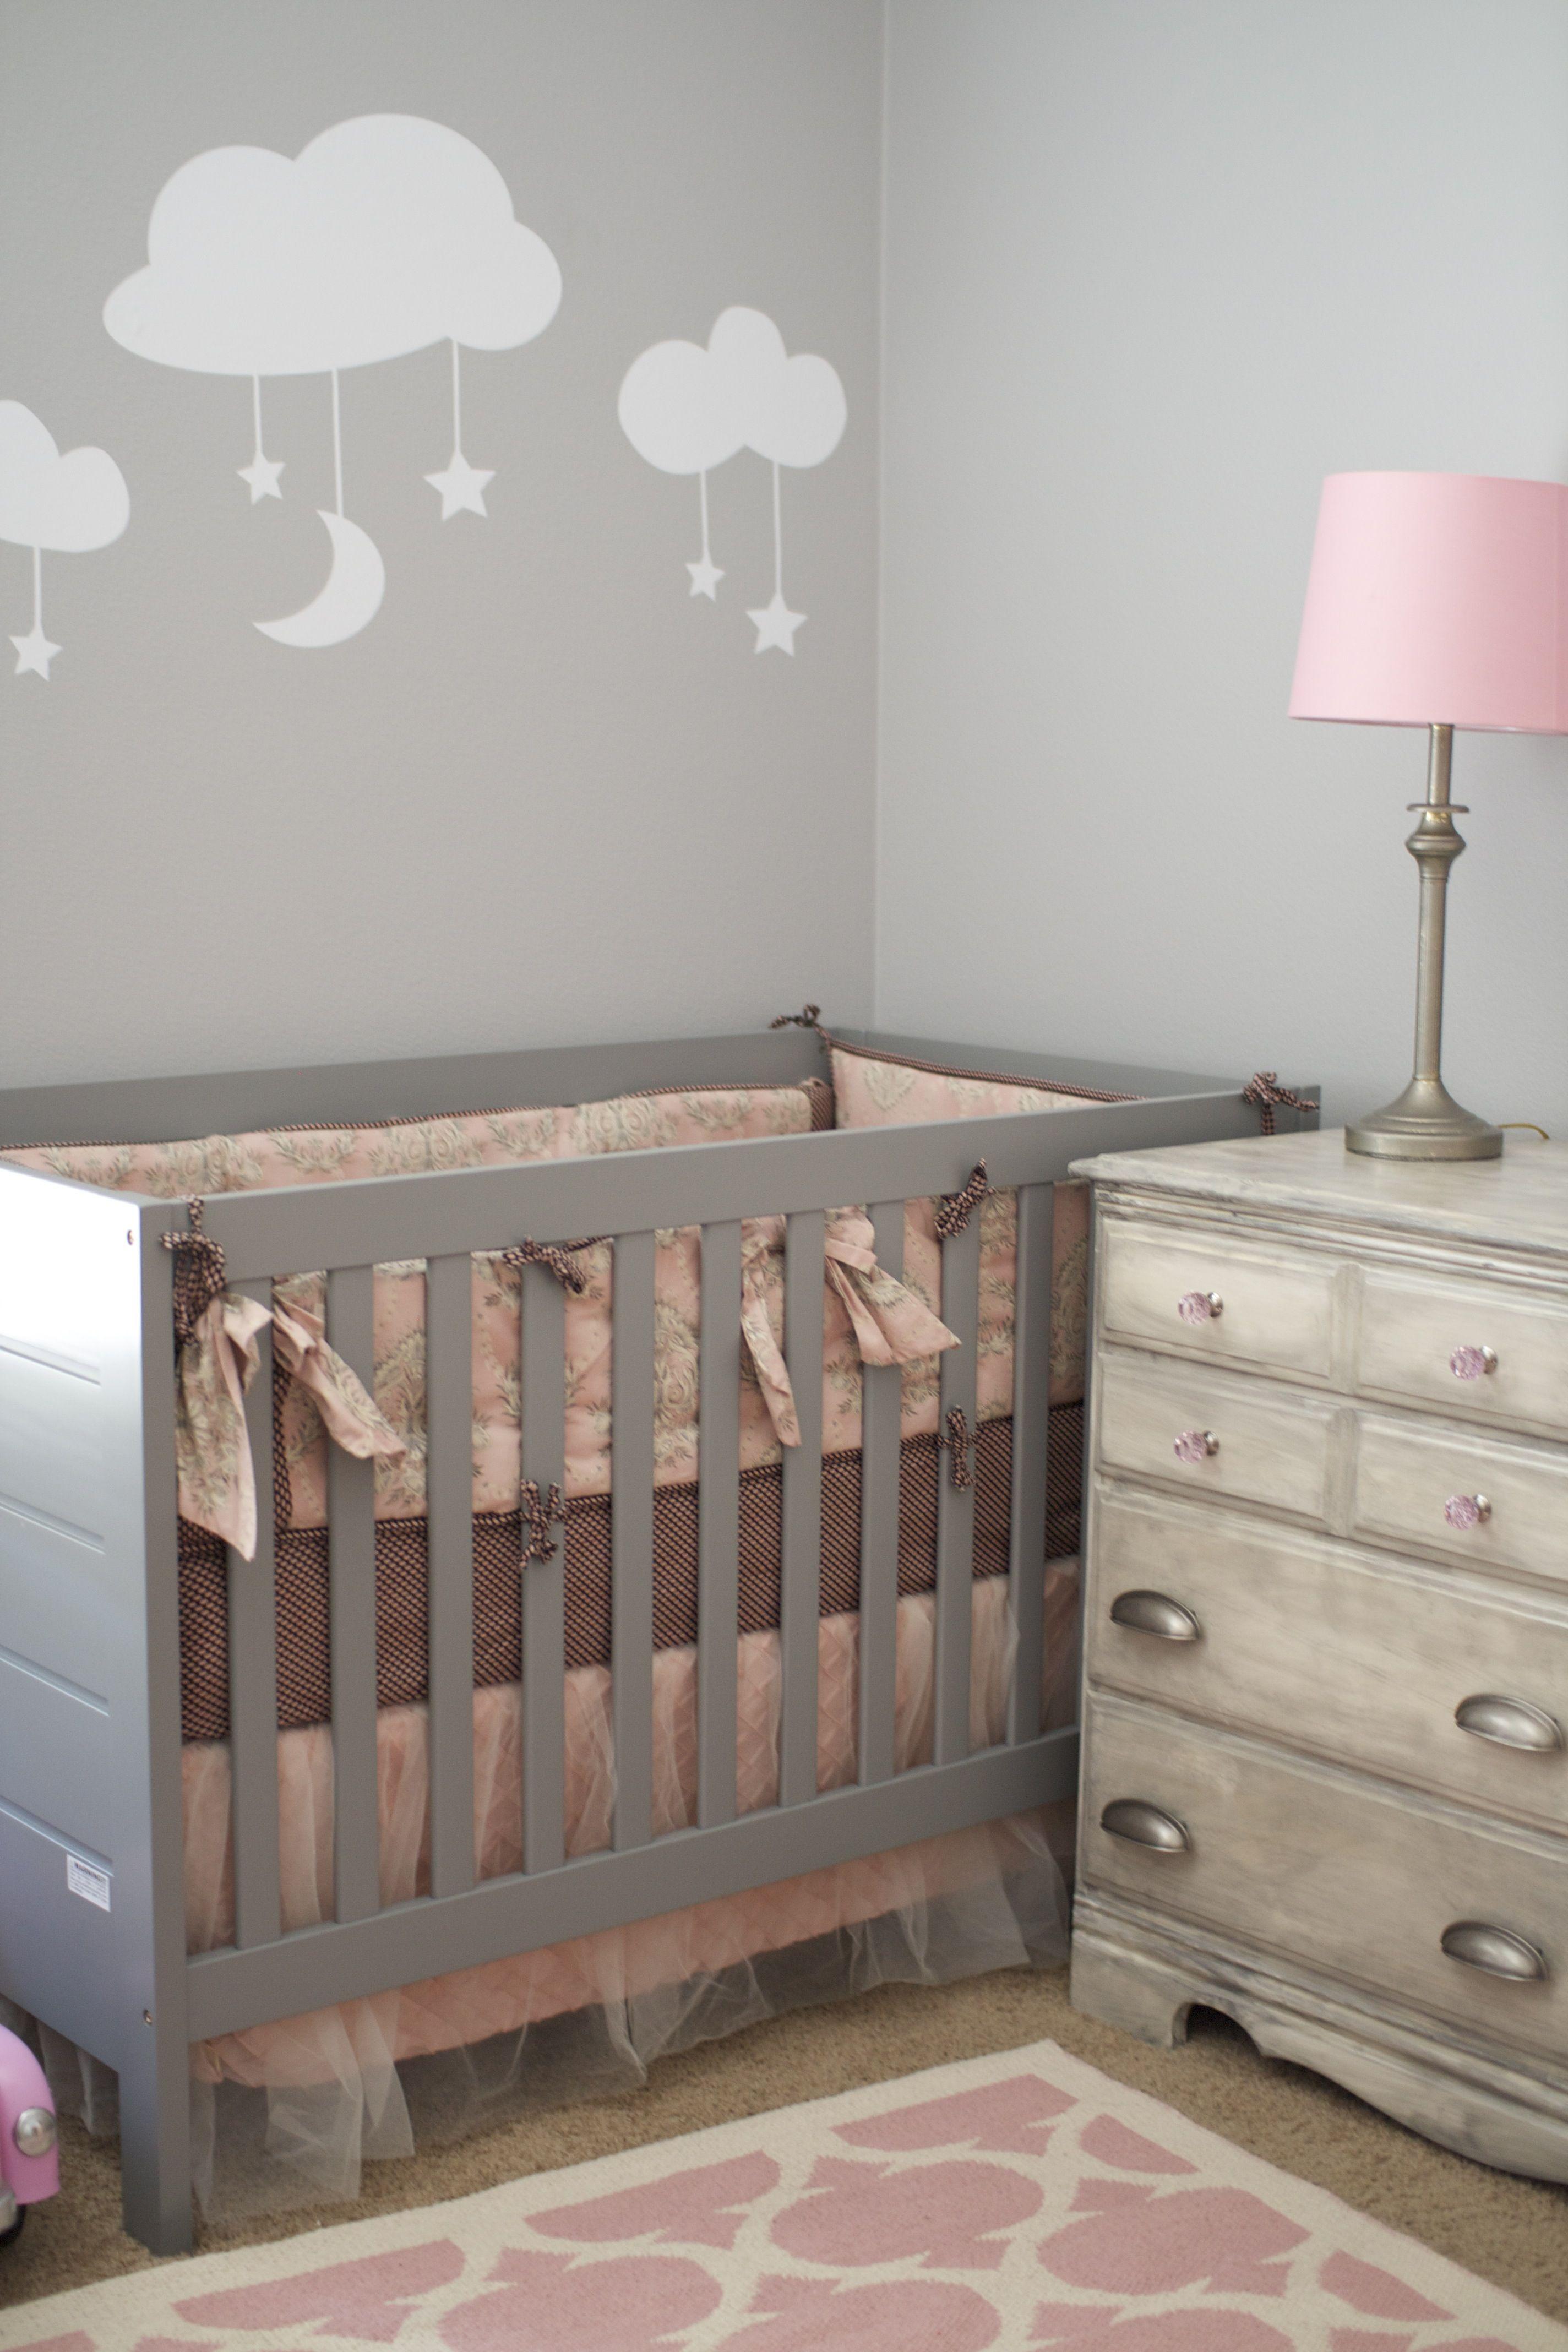 Pink And Gray Nursery Crib Is Babymod From Walmart Bedding